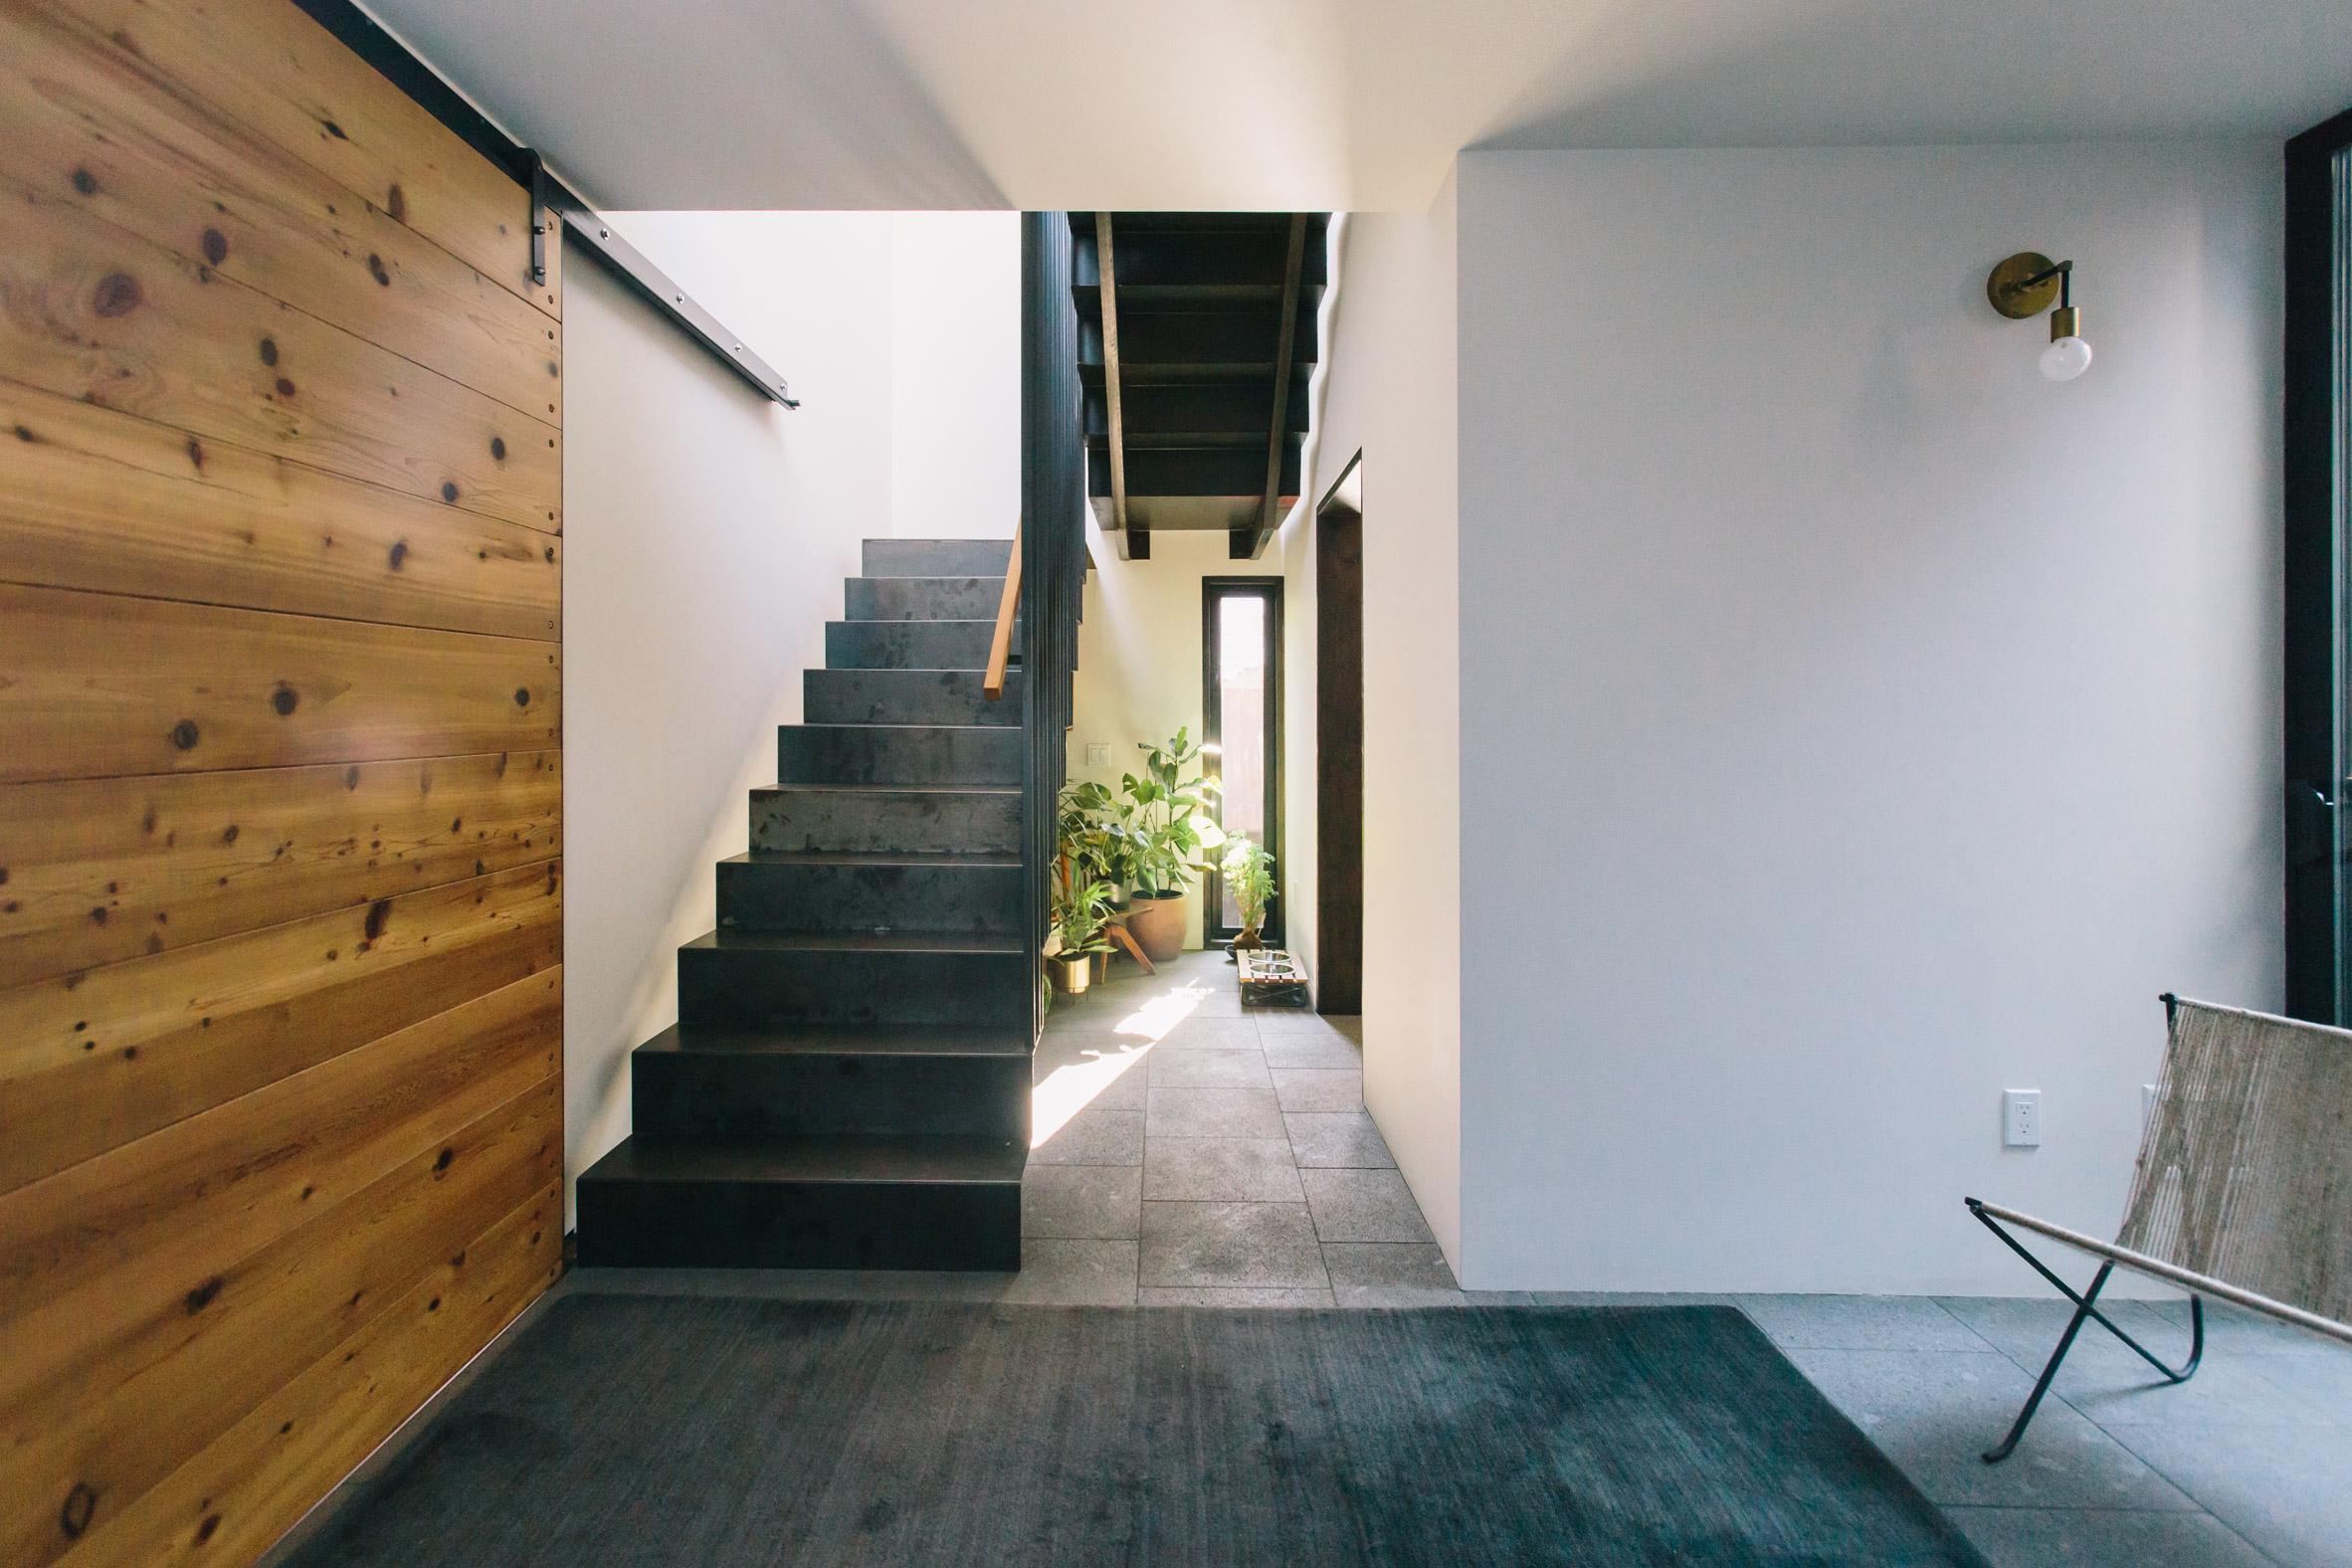 Redwood House by Jeff Svitak